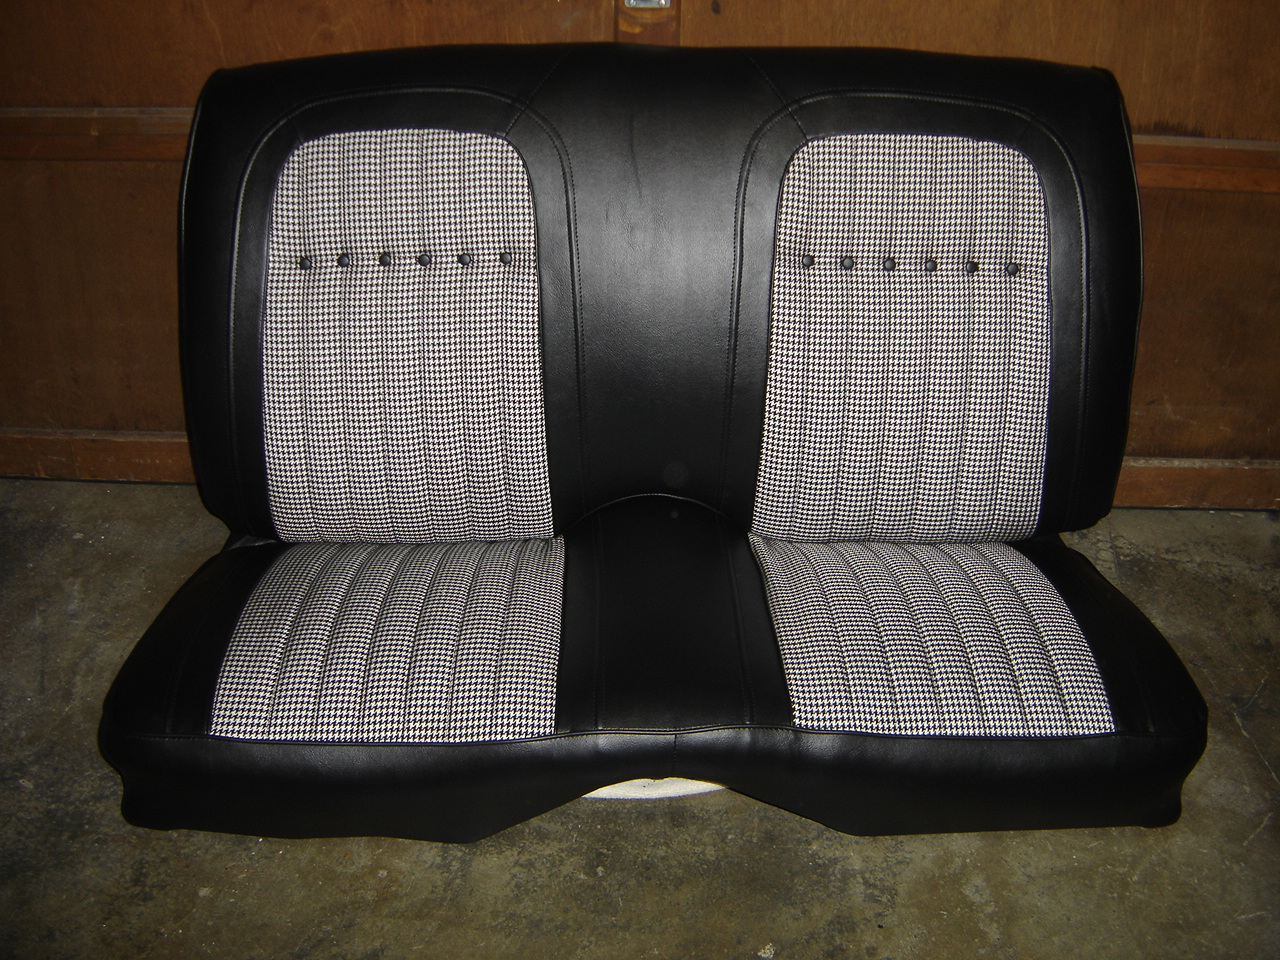 1969 Camaro Convertible Black Houndstooth Seat Classic